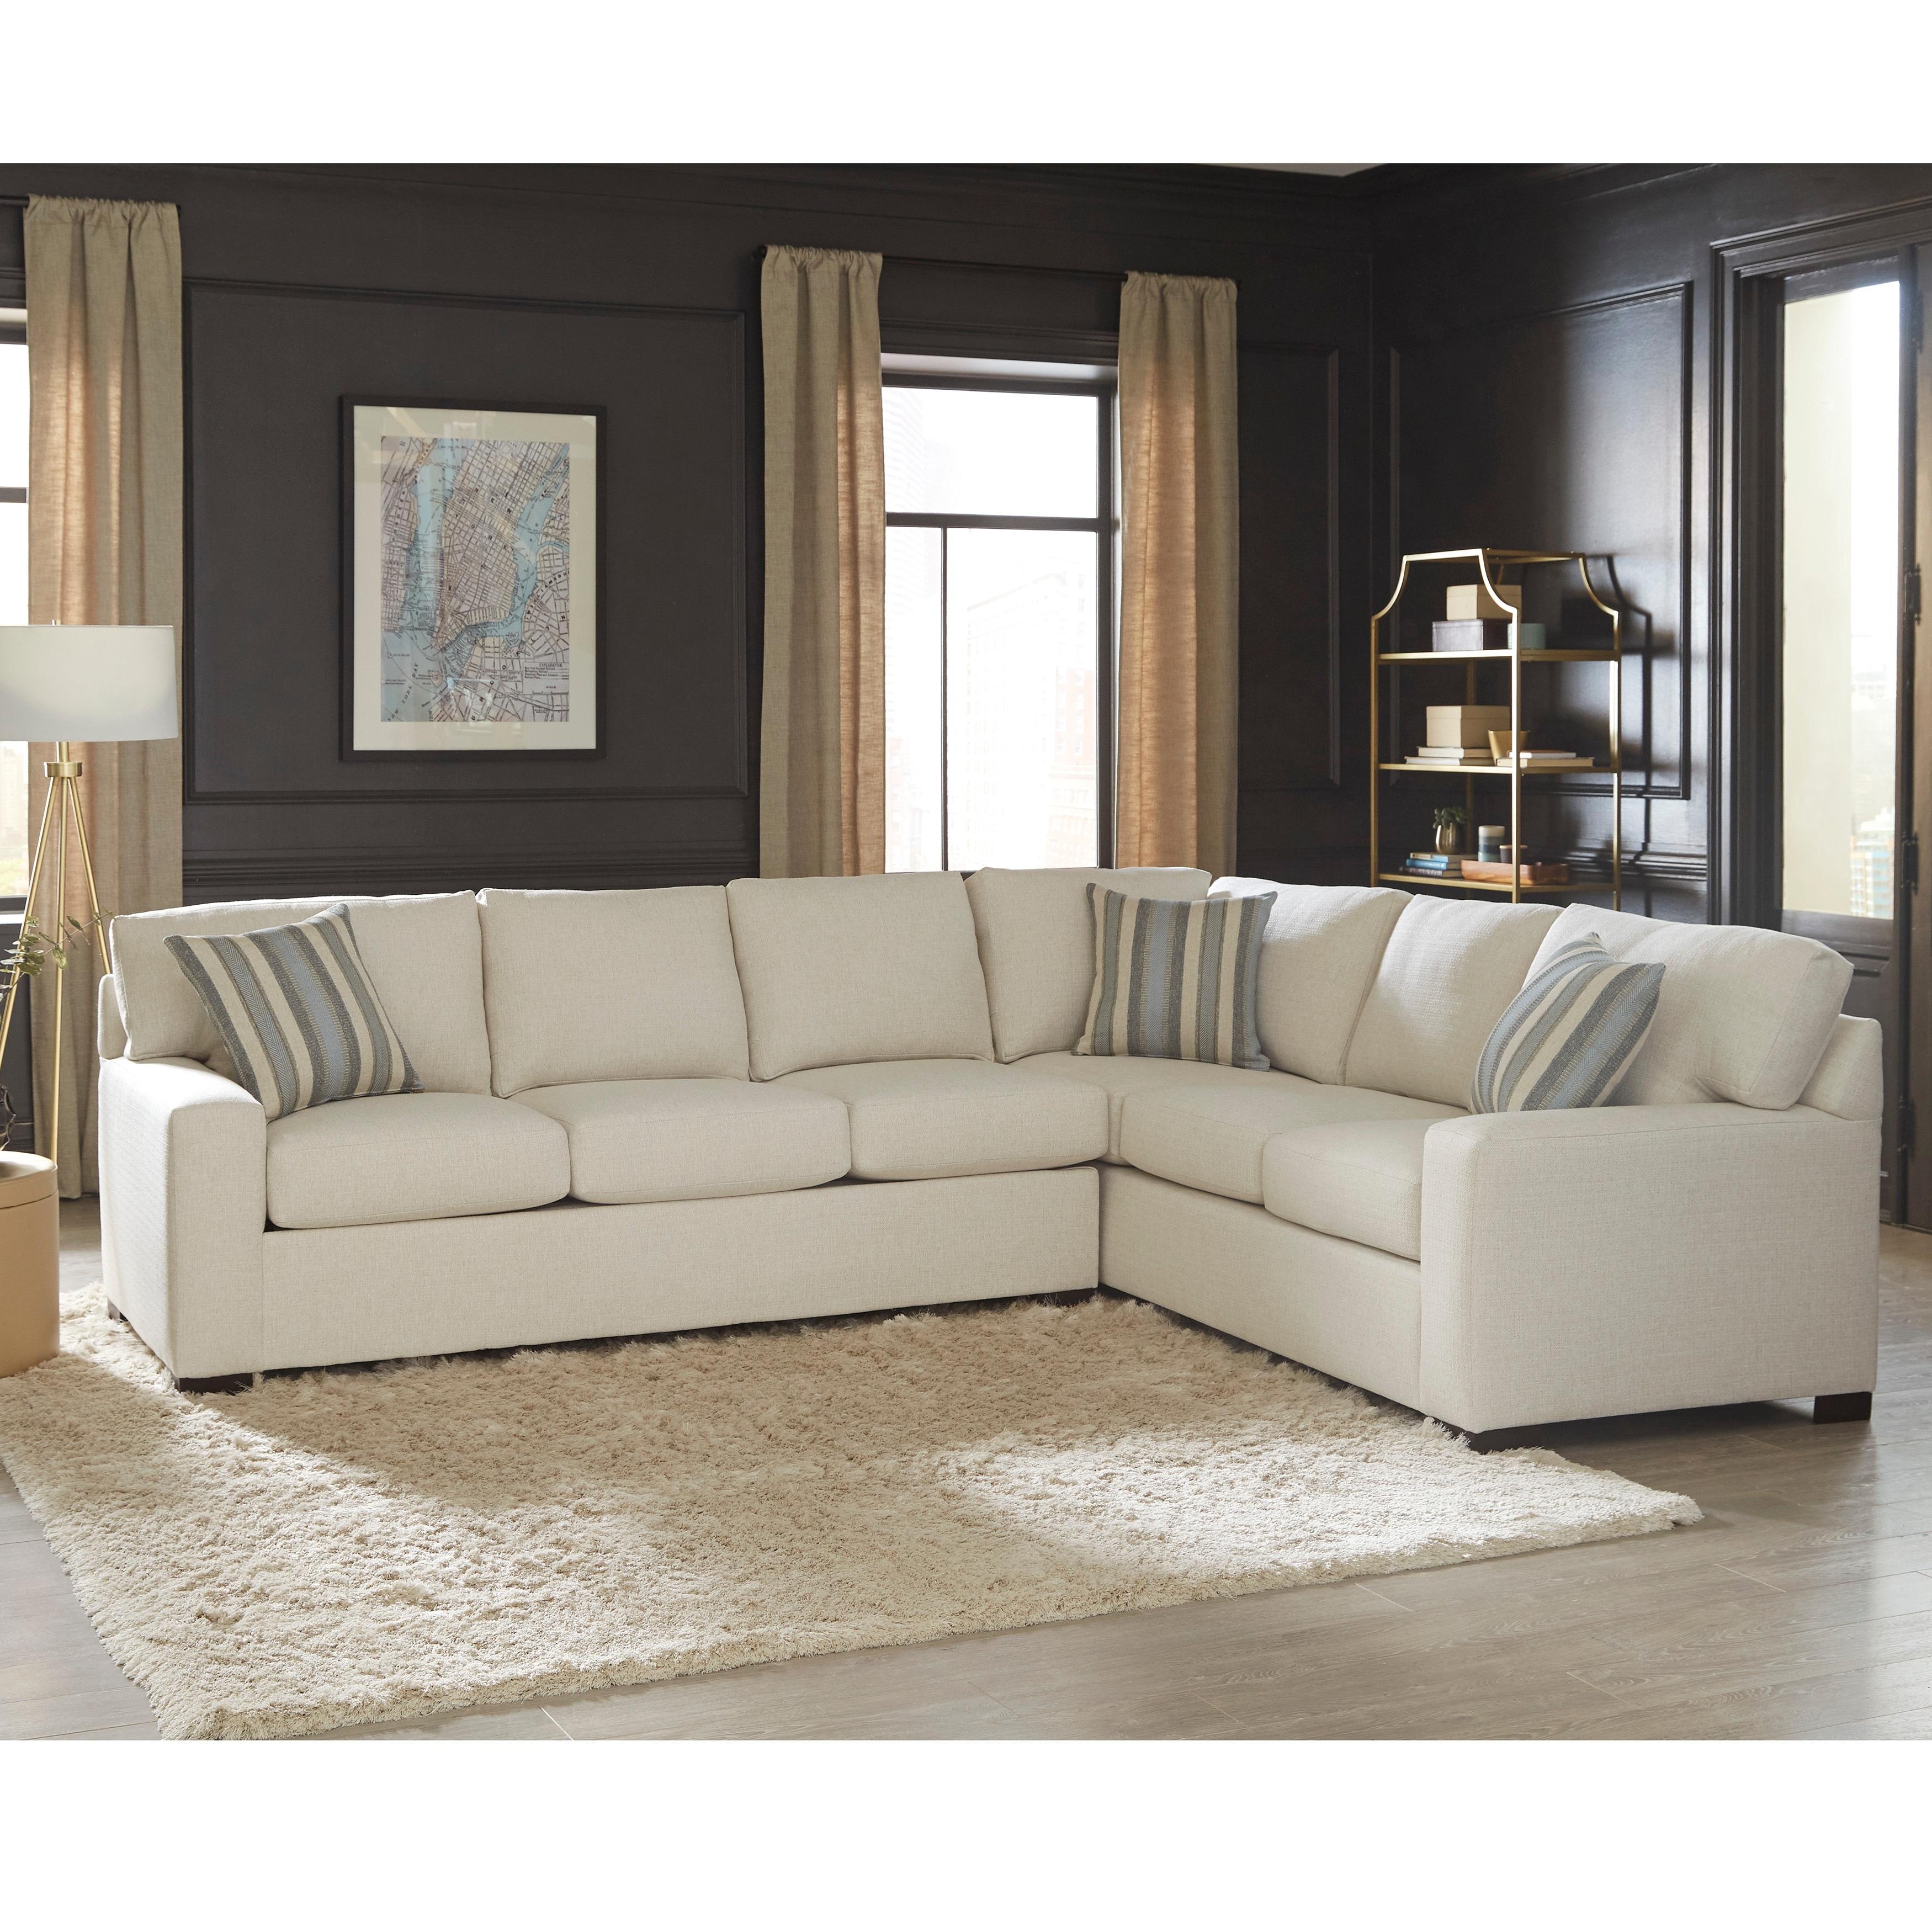 Picture of: Kobe Cream Sectional Sofa Bed With Queen Gel Memory Foam Mattress Overstock 31286322